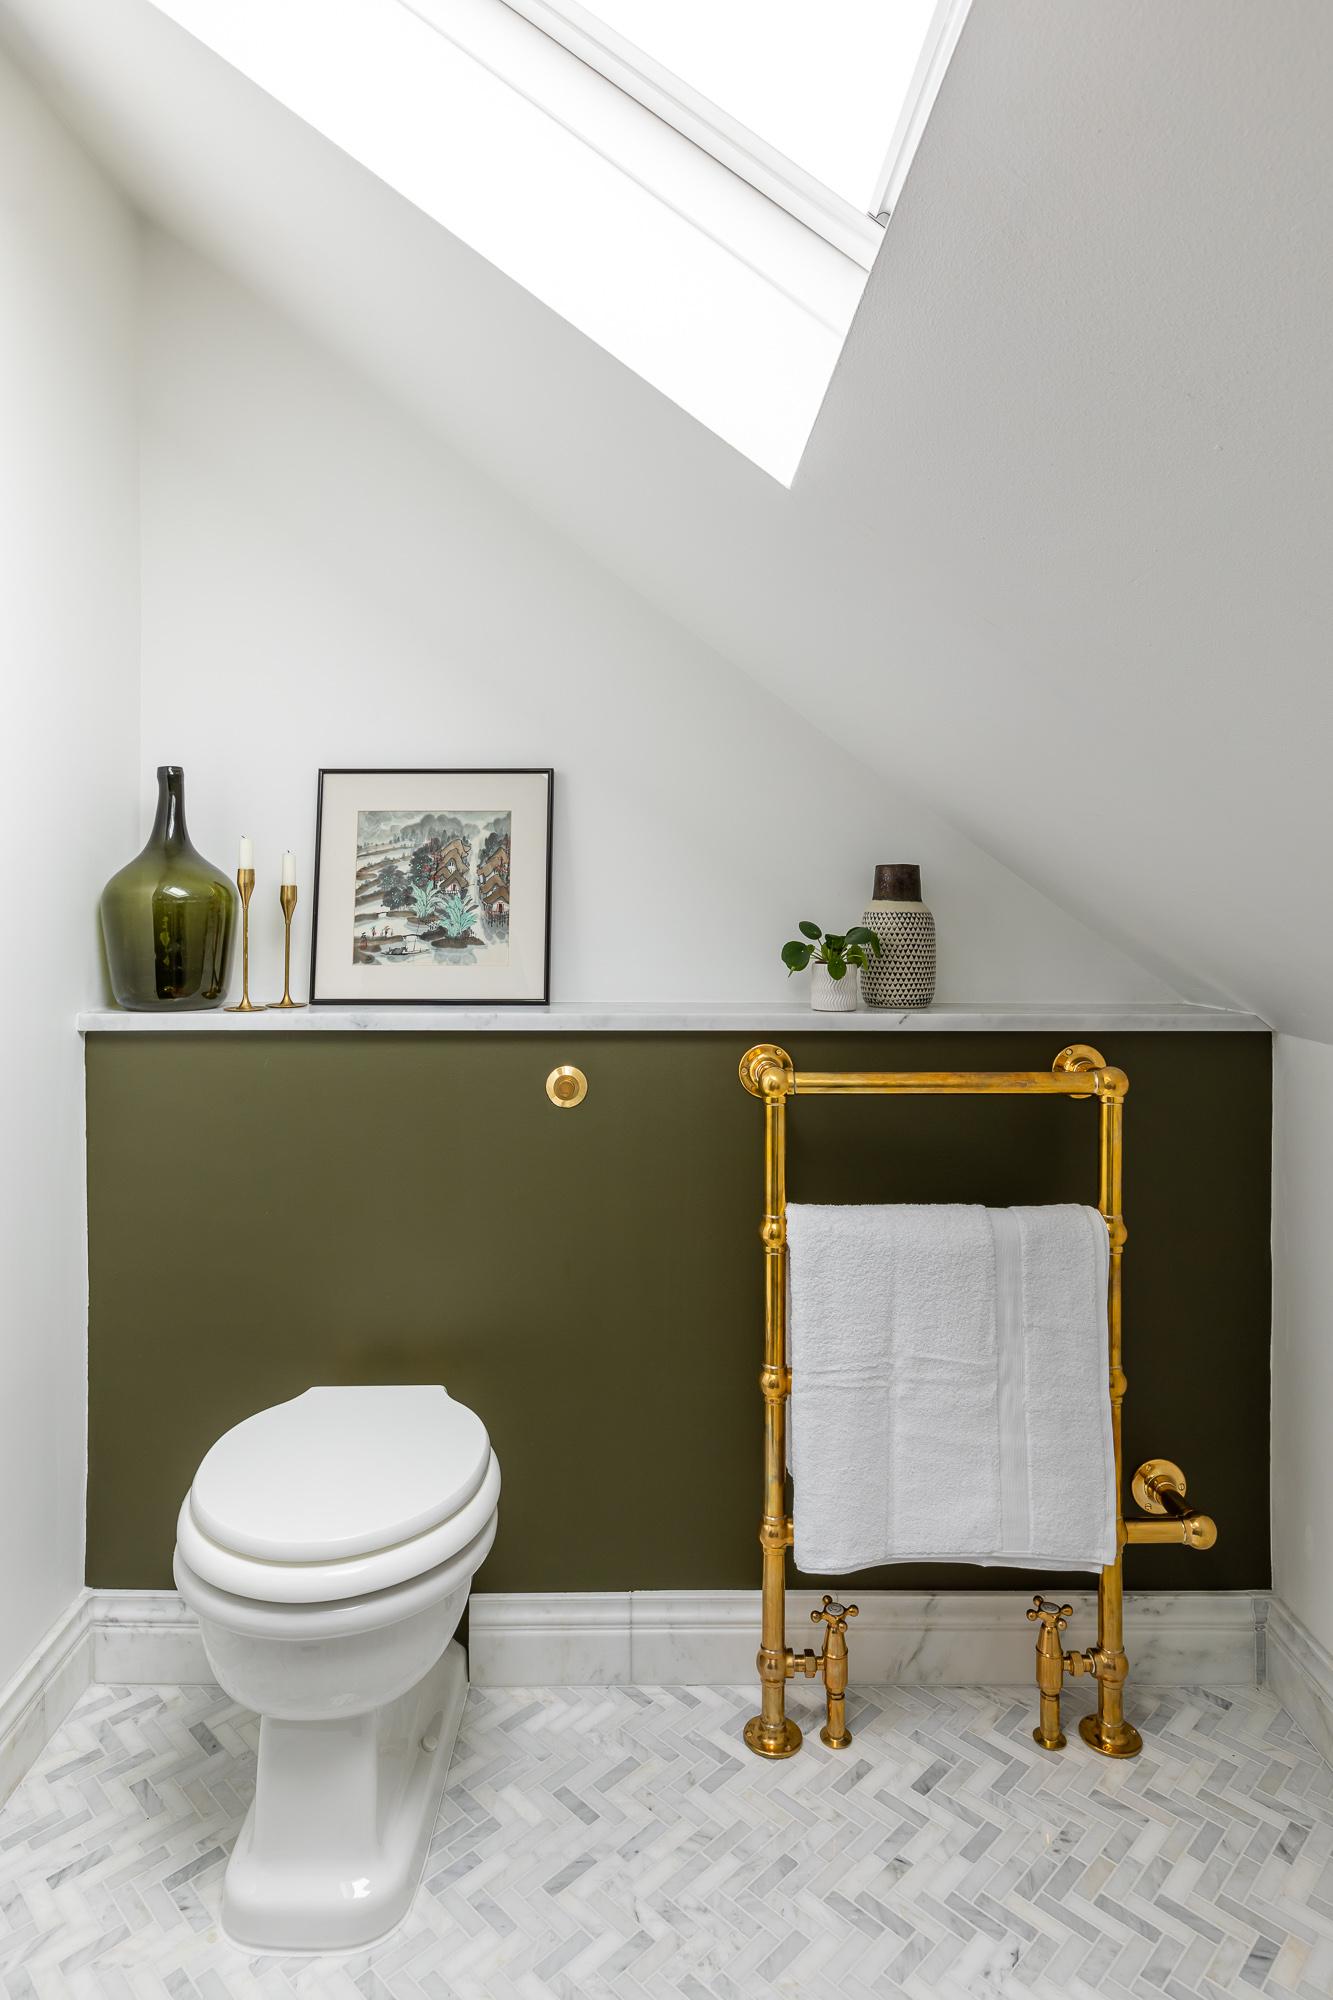 jonathan bond,  bathroom toilet and gold towel radiator, clapham, london